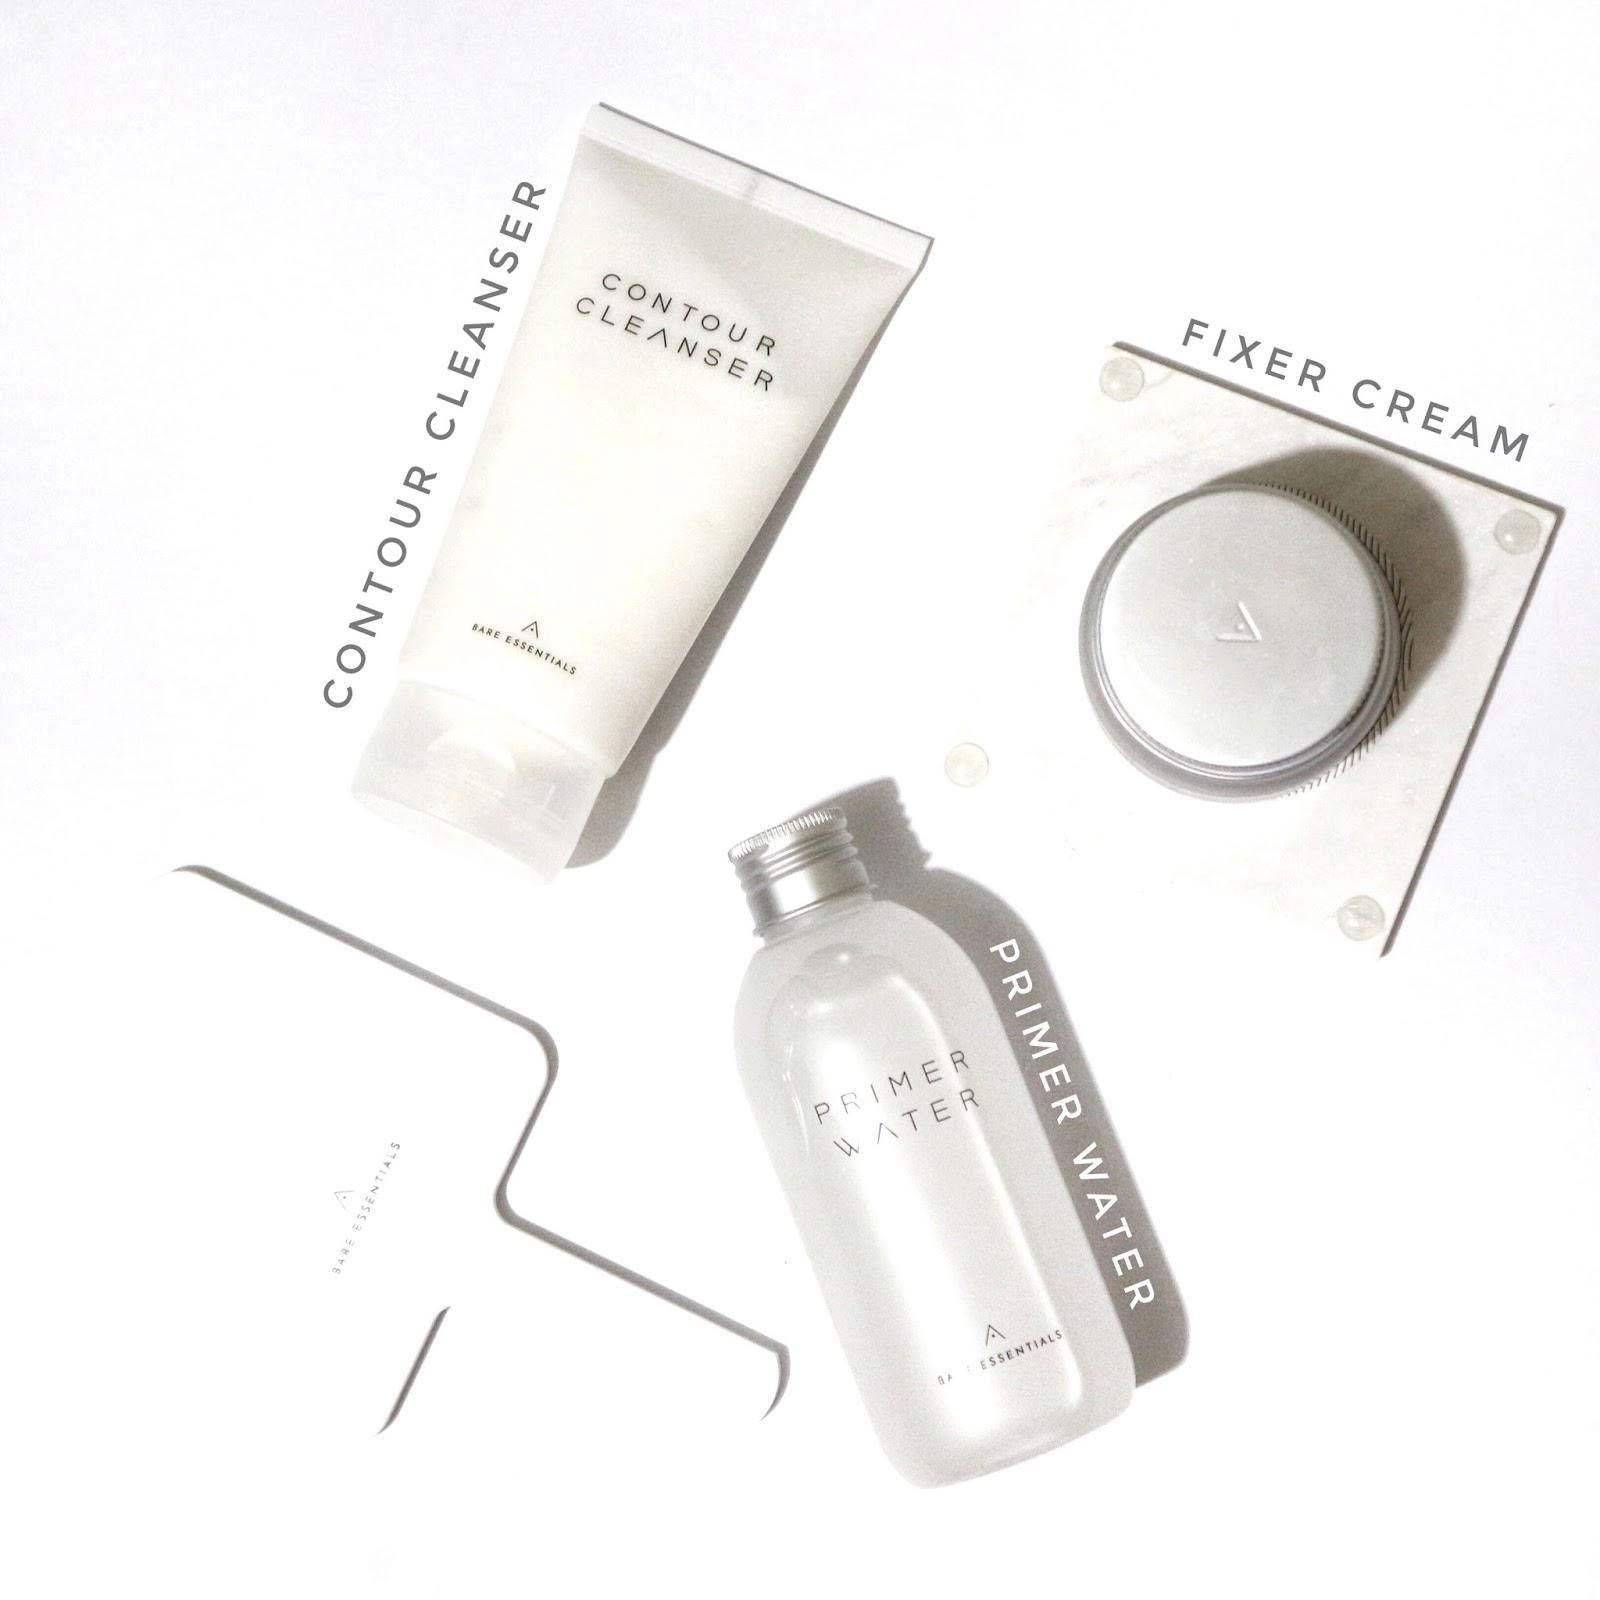 Althea Korea Bare Essentials flatlay (Contour cleanser, primer water, fixer cream)